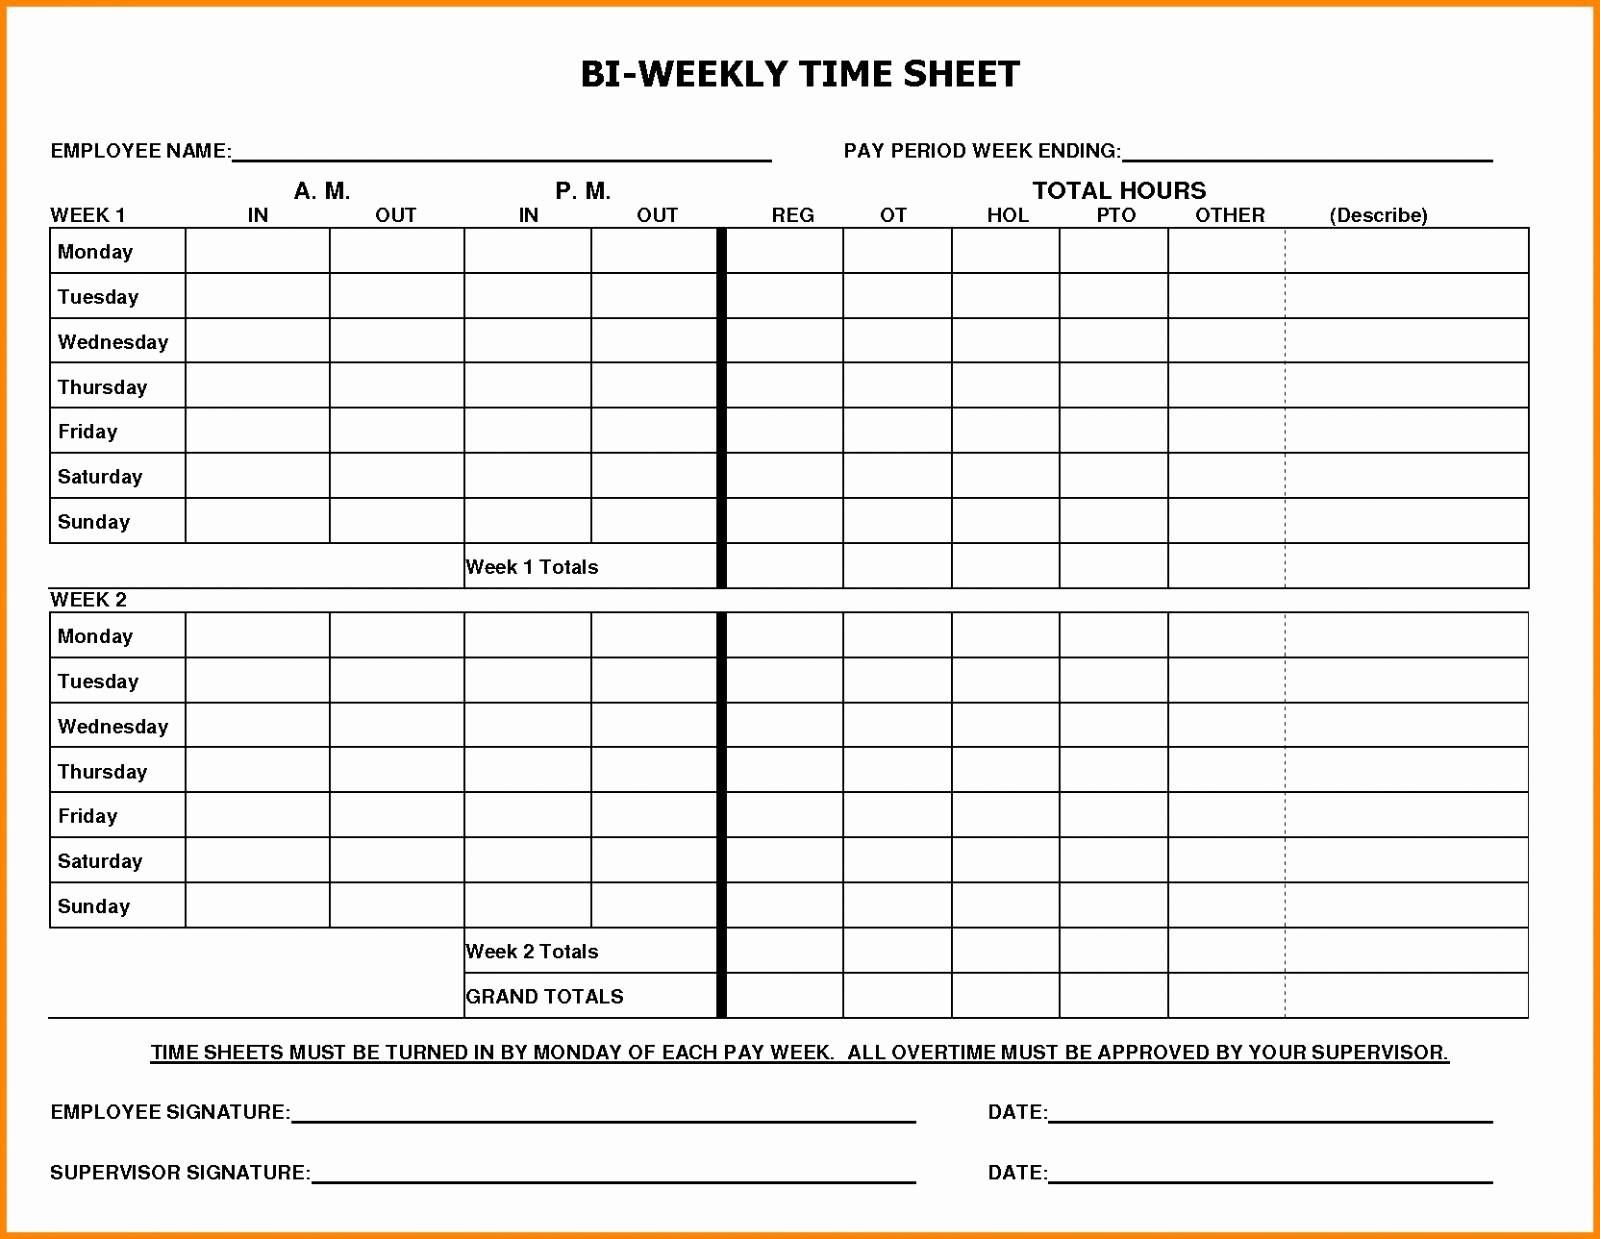 Free Bi Weekly Timesheet Calculator Lovely Free Bi Weekly Time Card Calculator with Lunch Biweekly